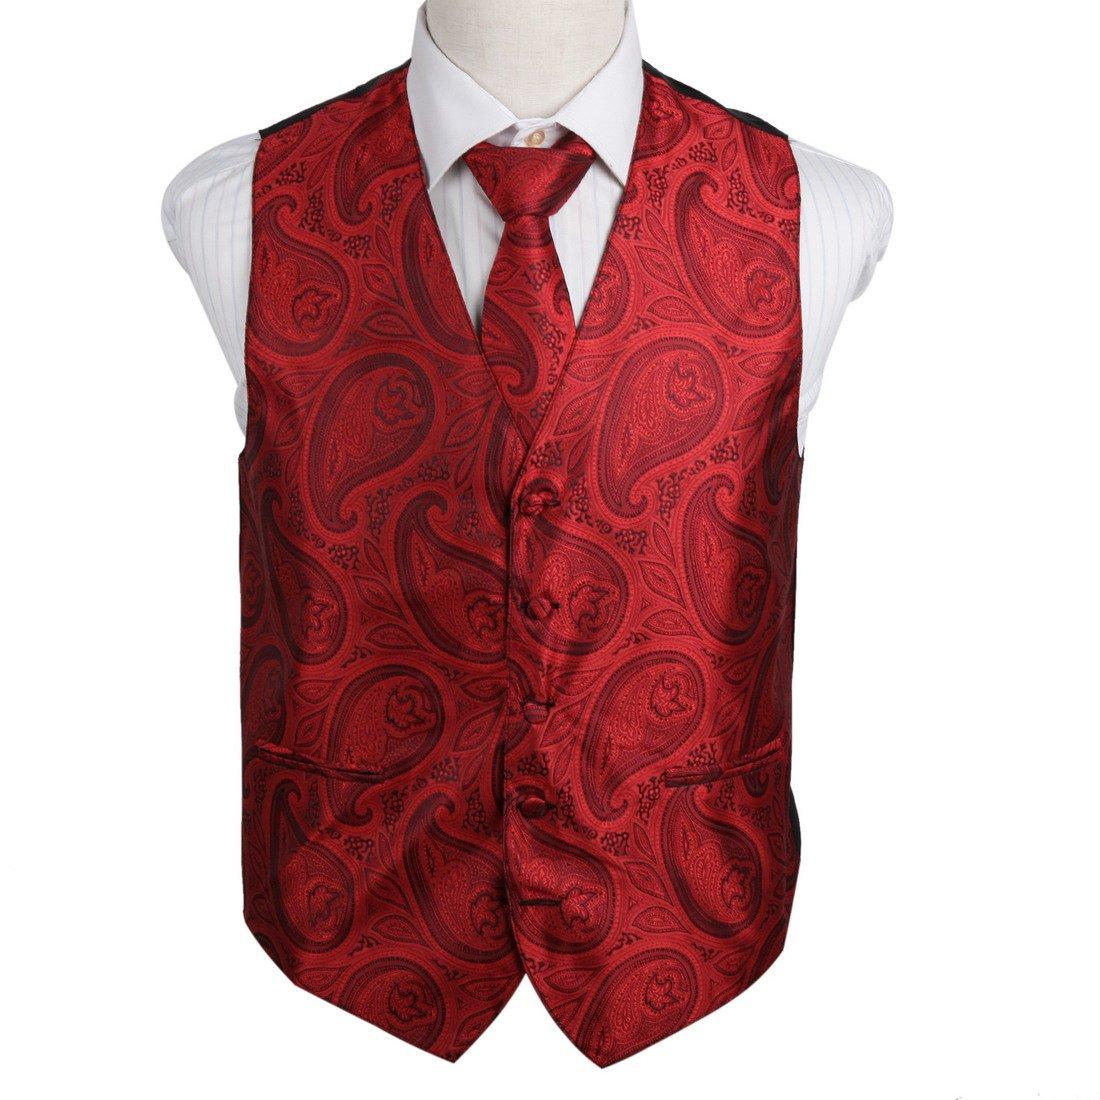 EGD2B04B-2XL Red Patterns Microfiber Dress Tuxedo Vest Neck Tie Set Series For Groomsmen By Epoint